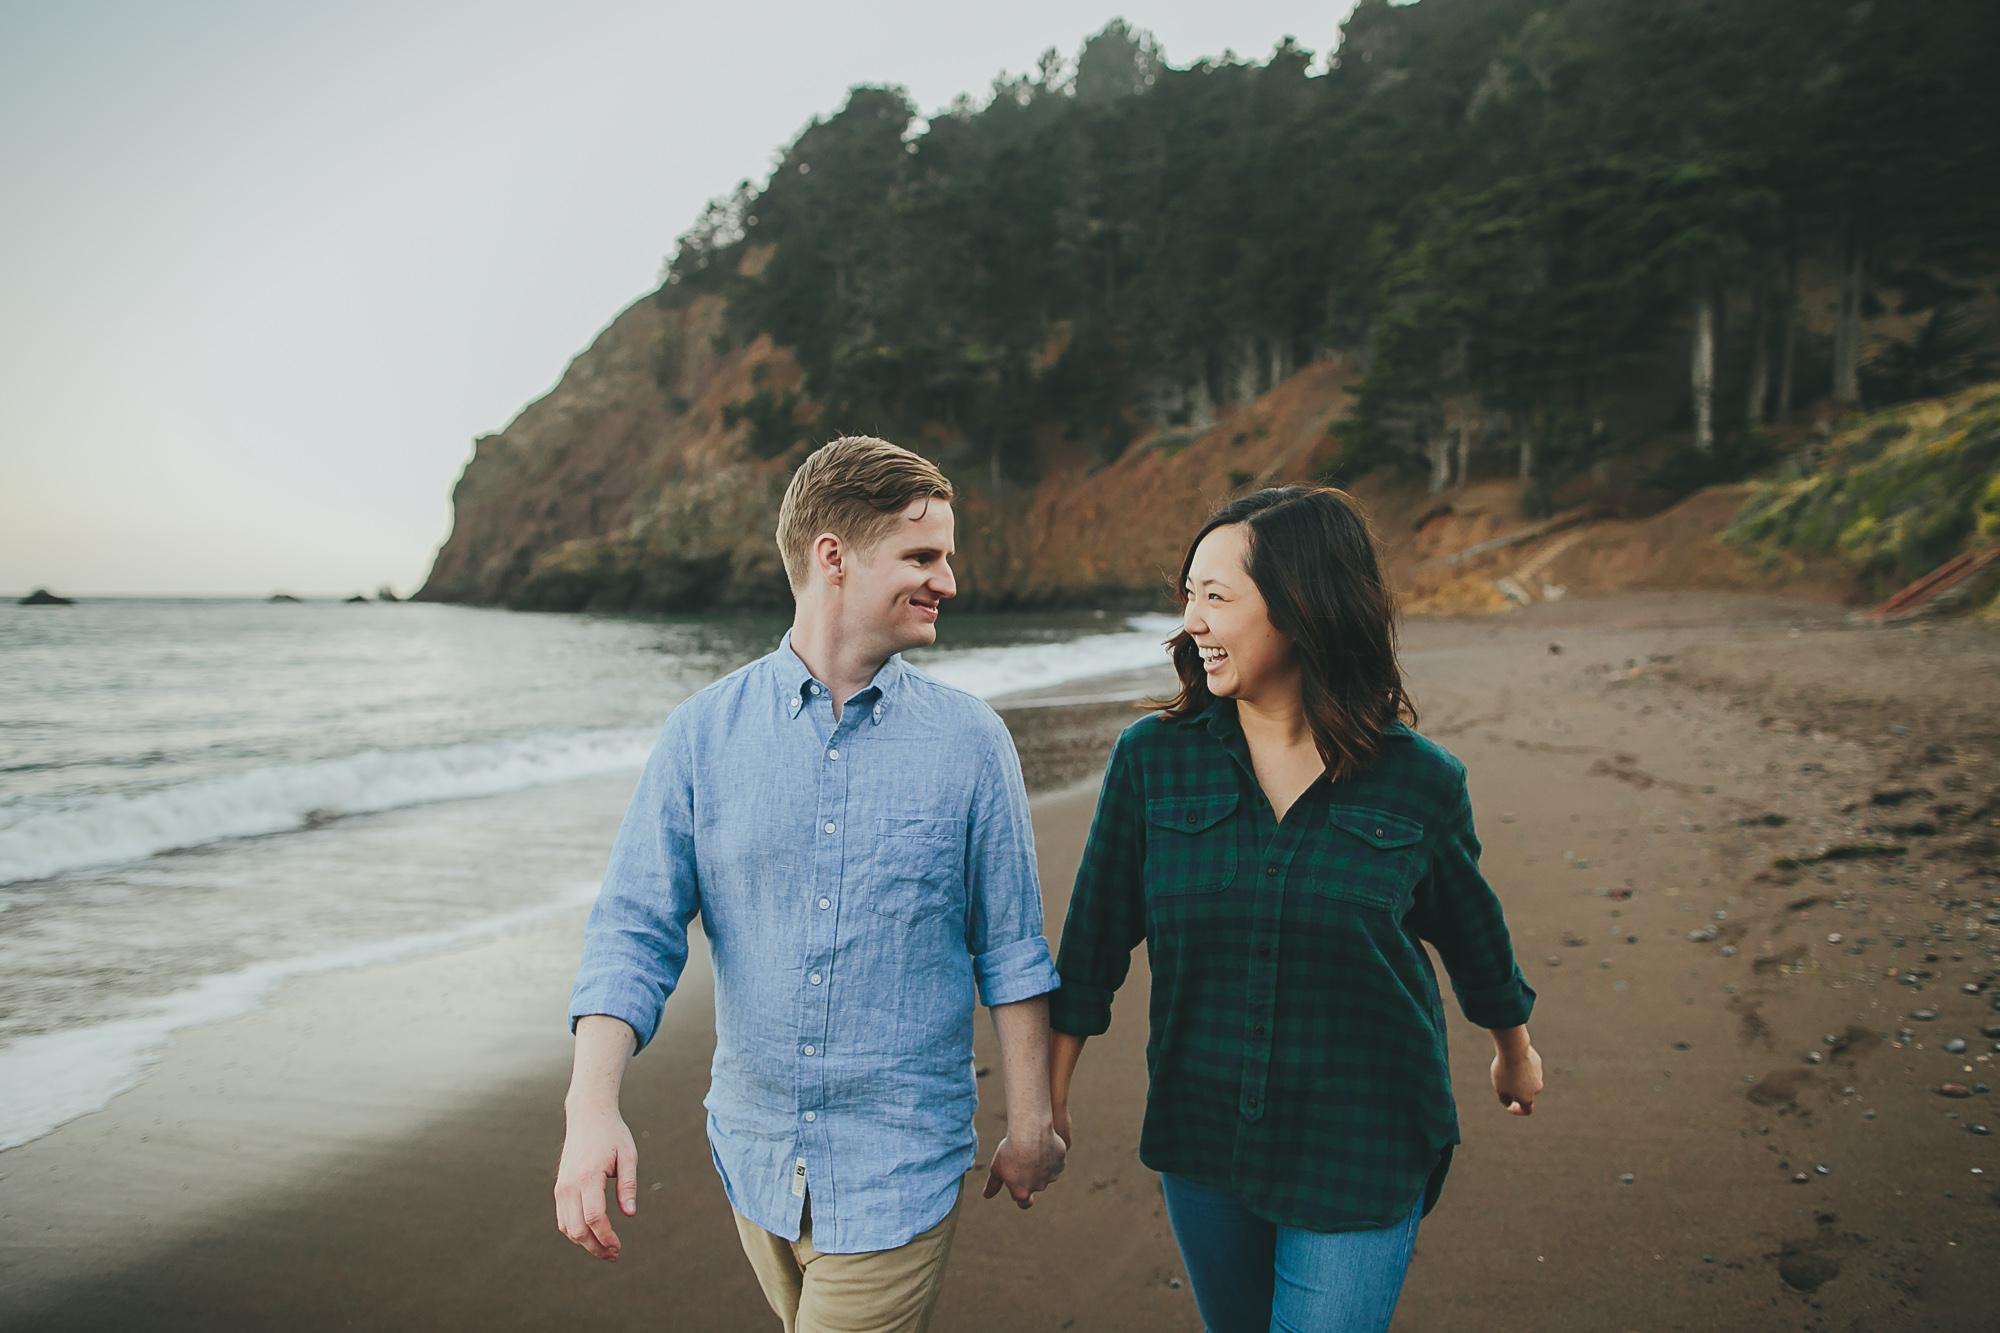 Jenni+Kyle-BLOG_KELLYBOITANO_WEB-35